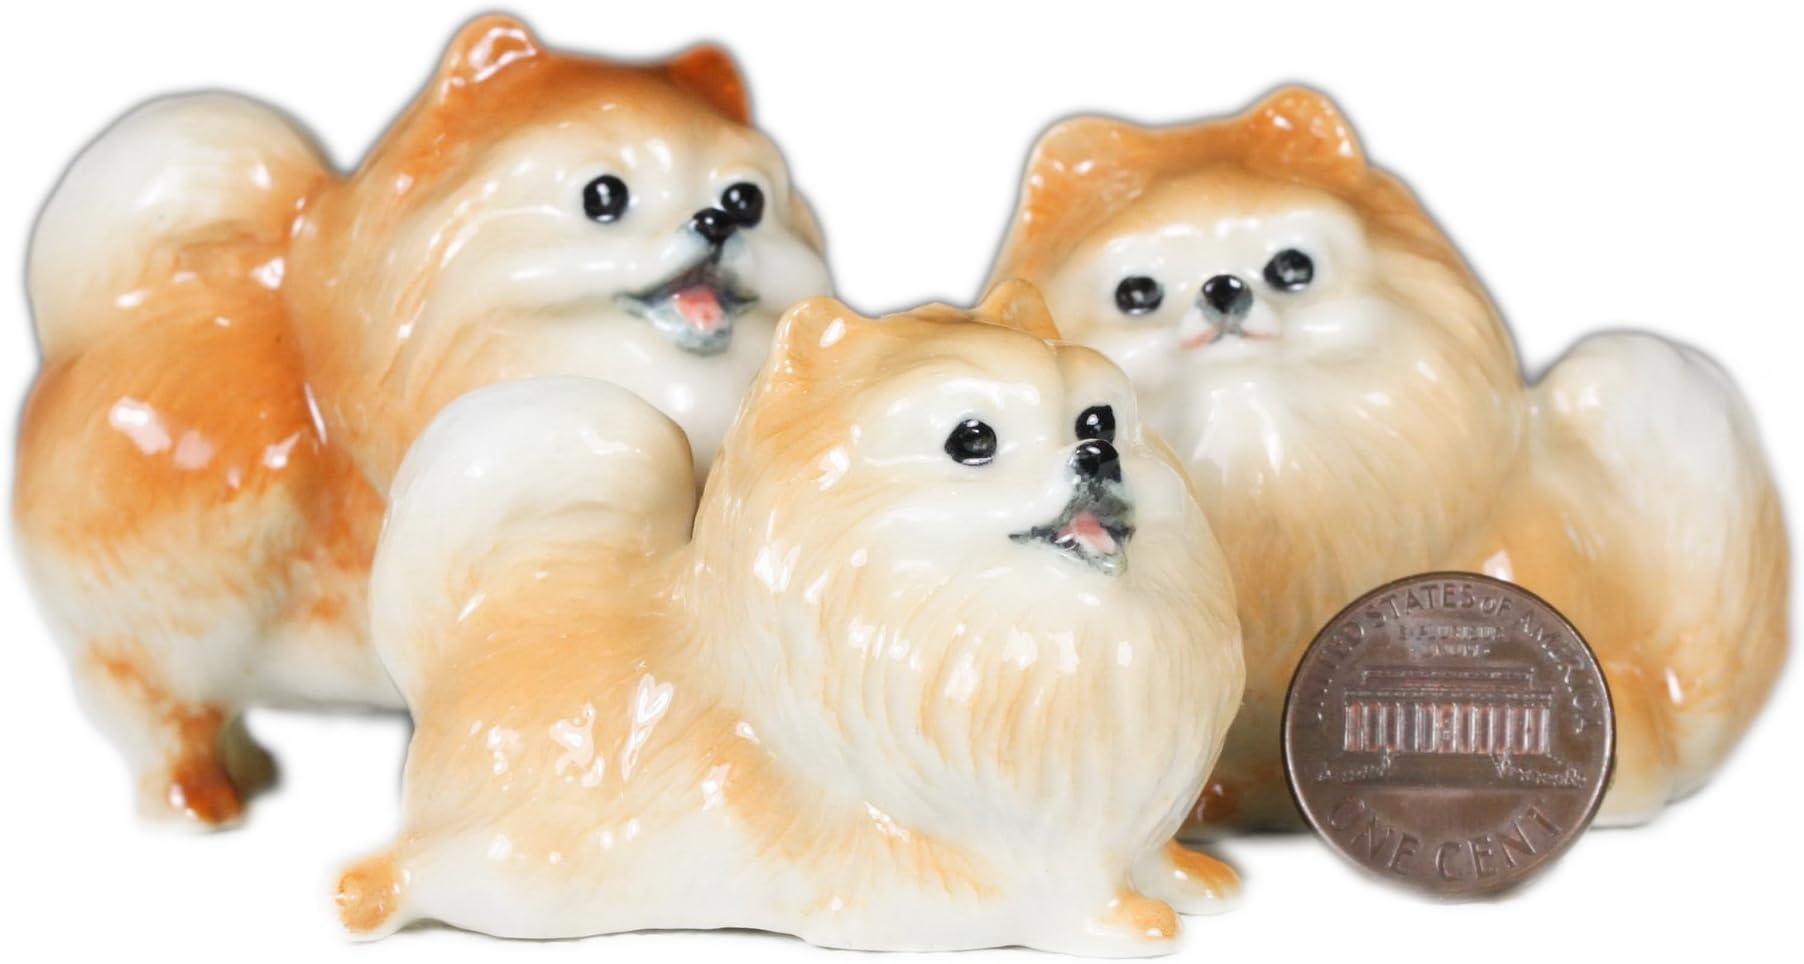 Tiny Porcelain Cocker Spaniel Pendant \u2022 Hand Painted \u2022 Hand Made \u2022 Gift For Her \u2022 Animal lover \u2022 Kids Gift \u2022 Cute Miniature Figurine AT111